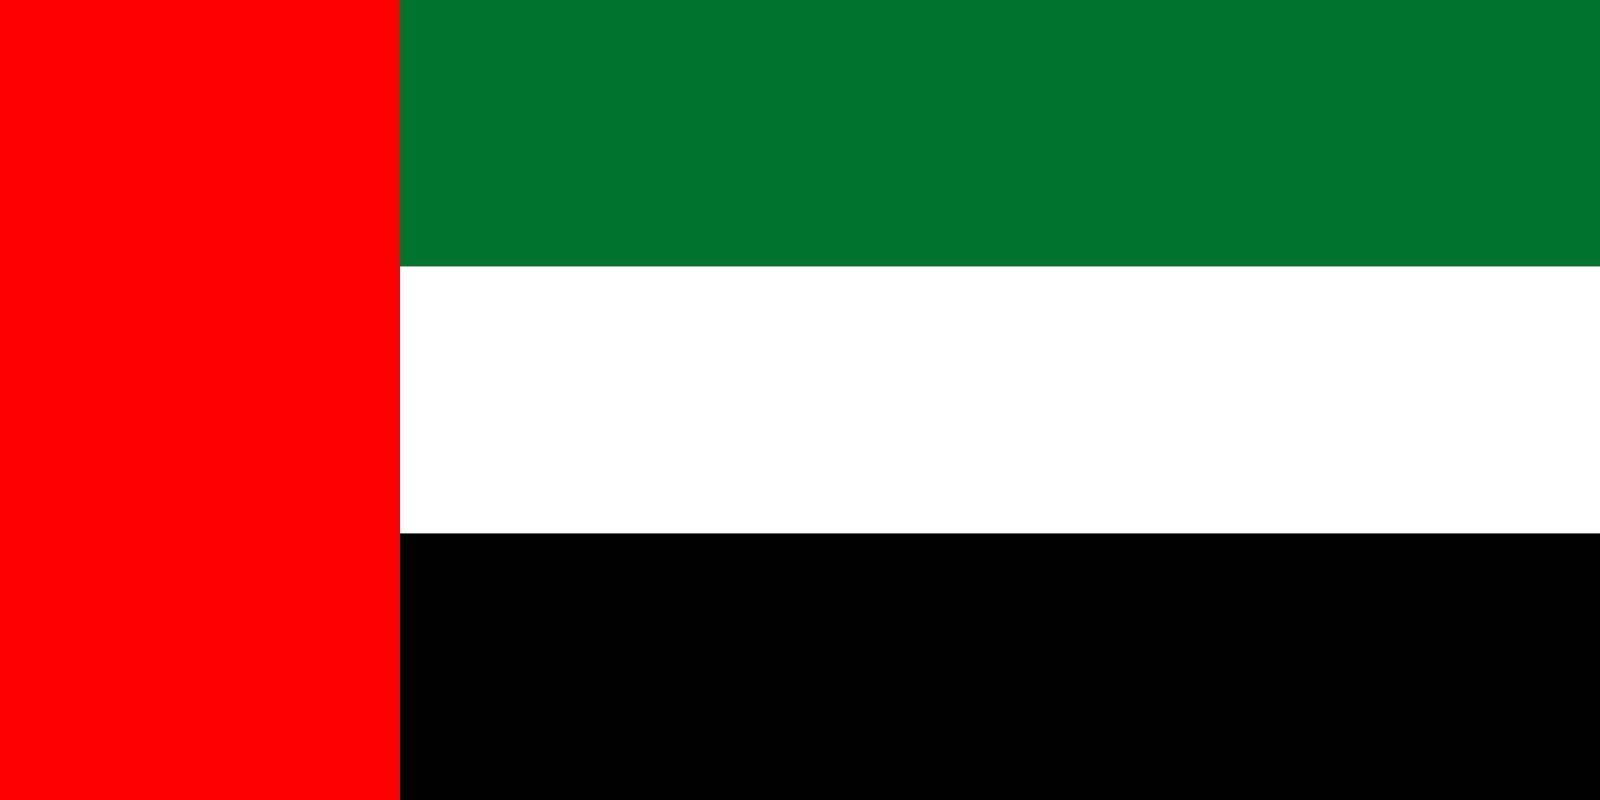 http://carbrandsincurrentproduction.blogspot.com.es/search/label/Arab%20Emirates